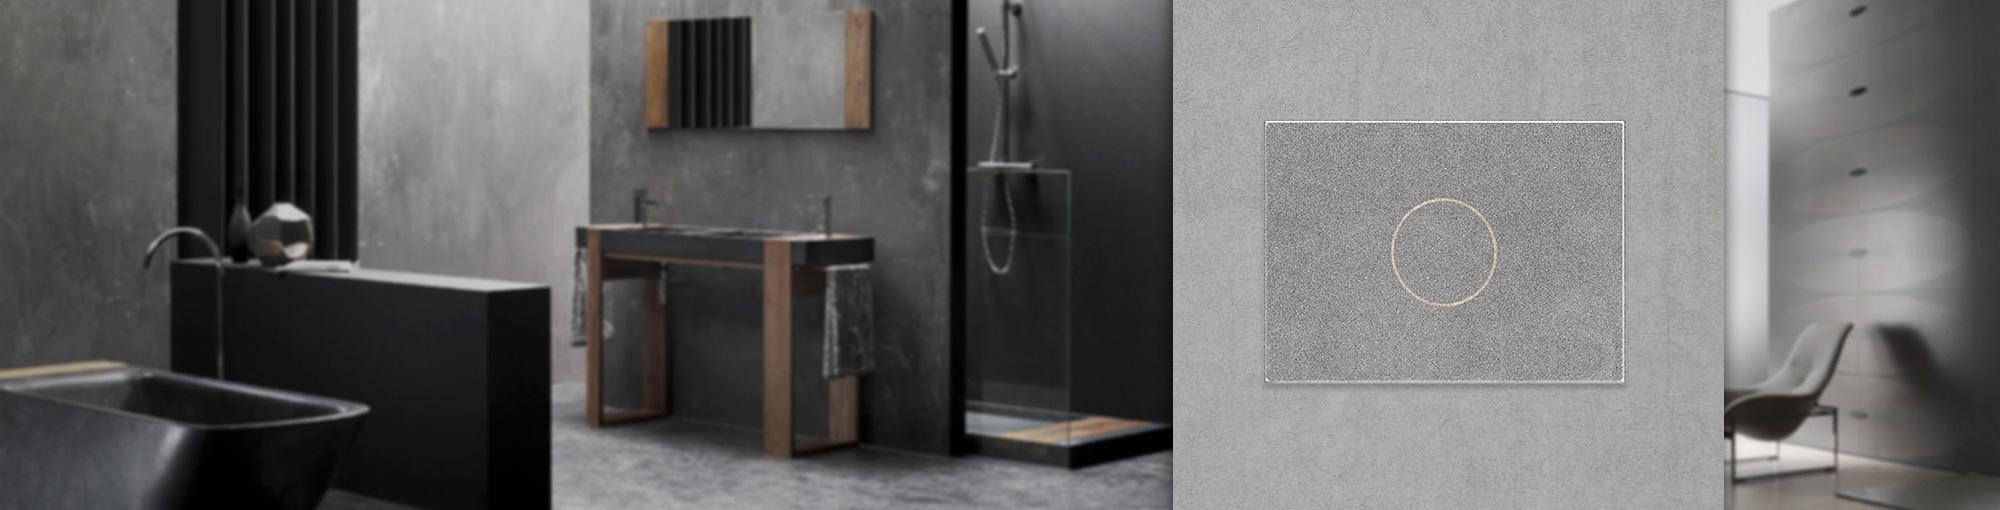 vitrum kolekcje wlaczvitrum. Black Bedroom Furniture Sets. Home Design Ideas